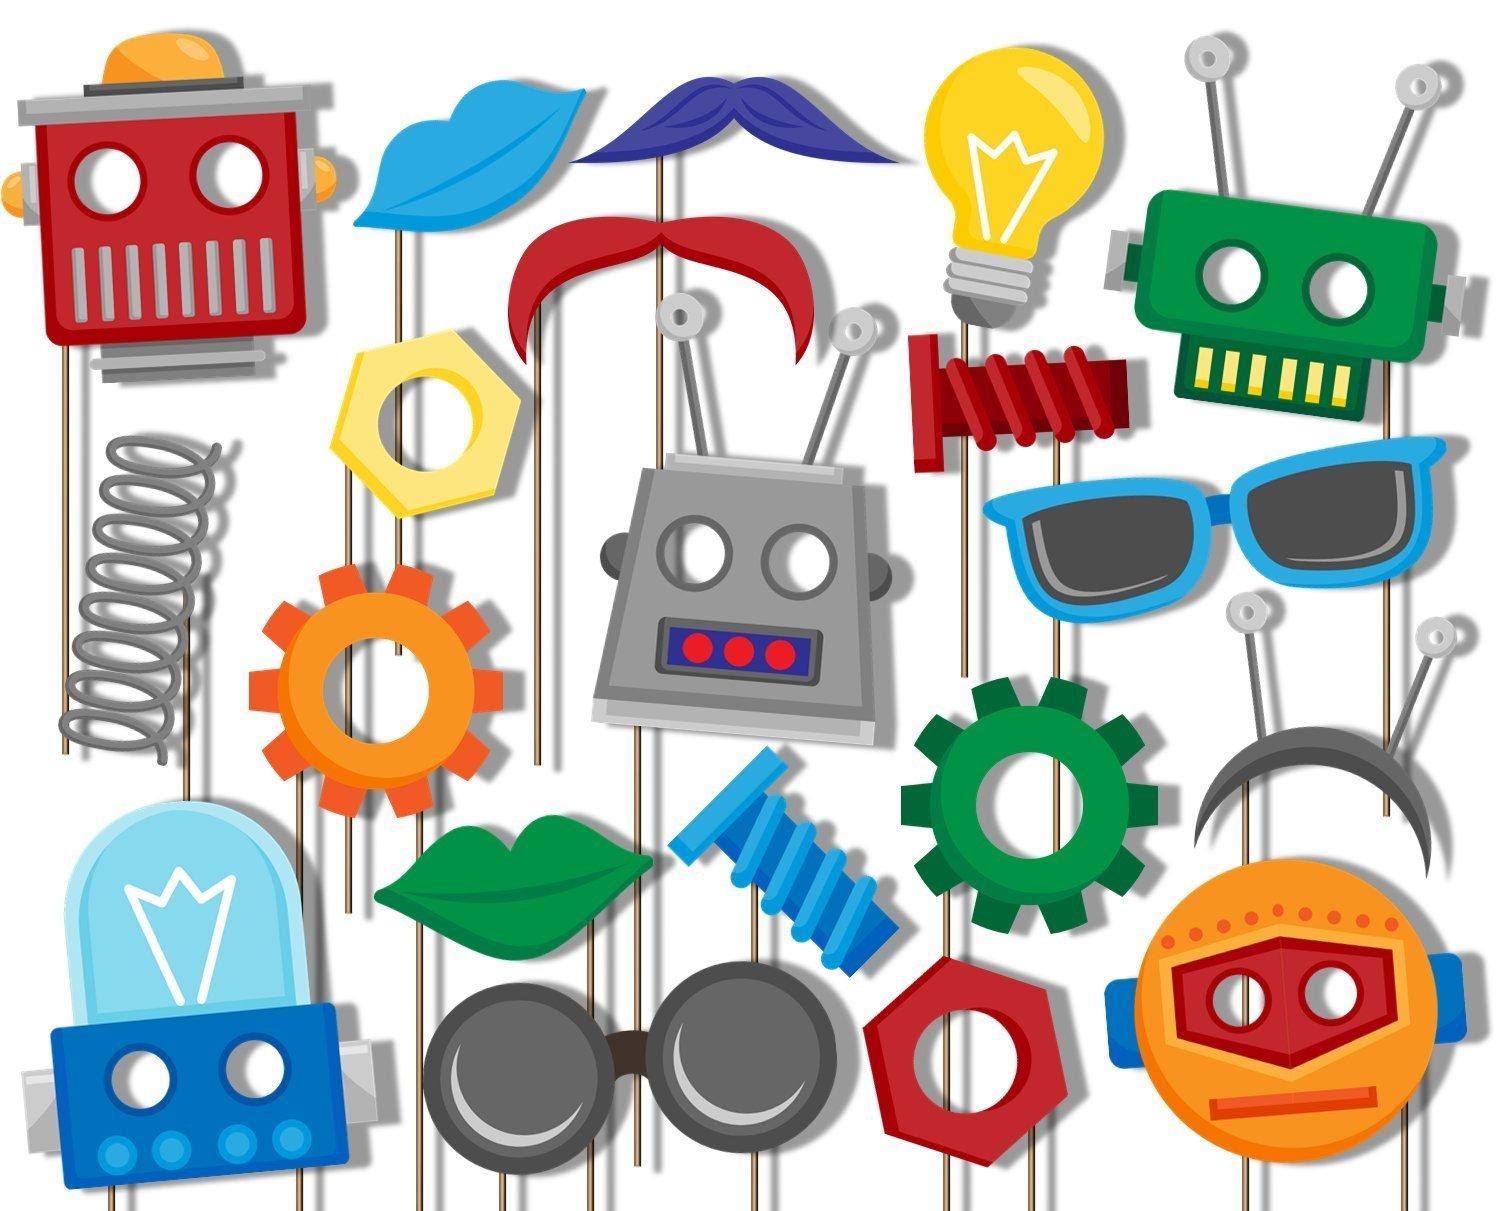 Maker Fun Factory VBS Decor Ideas.